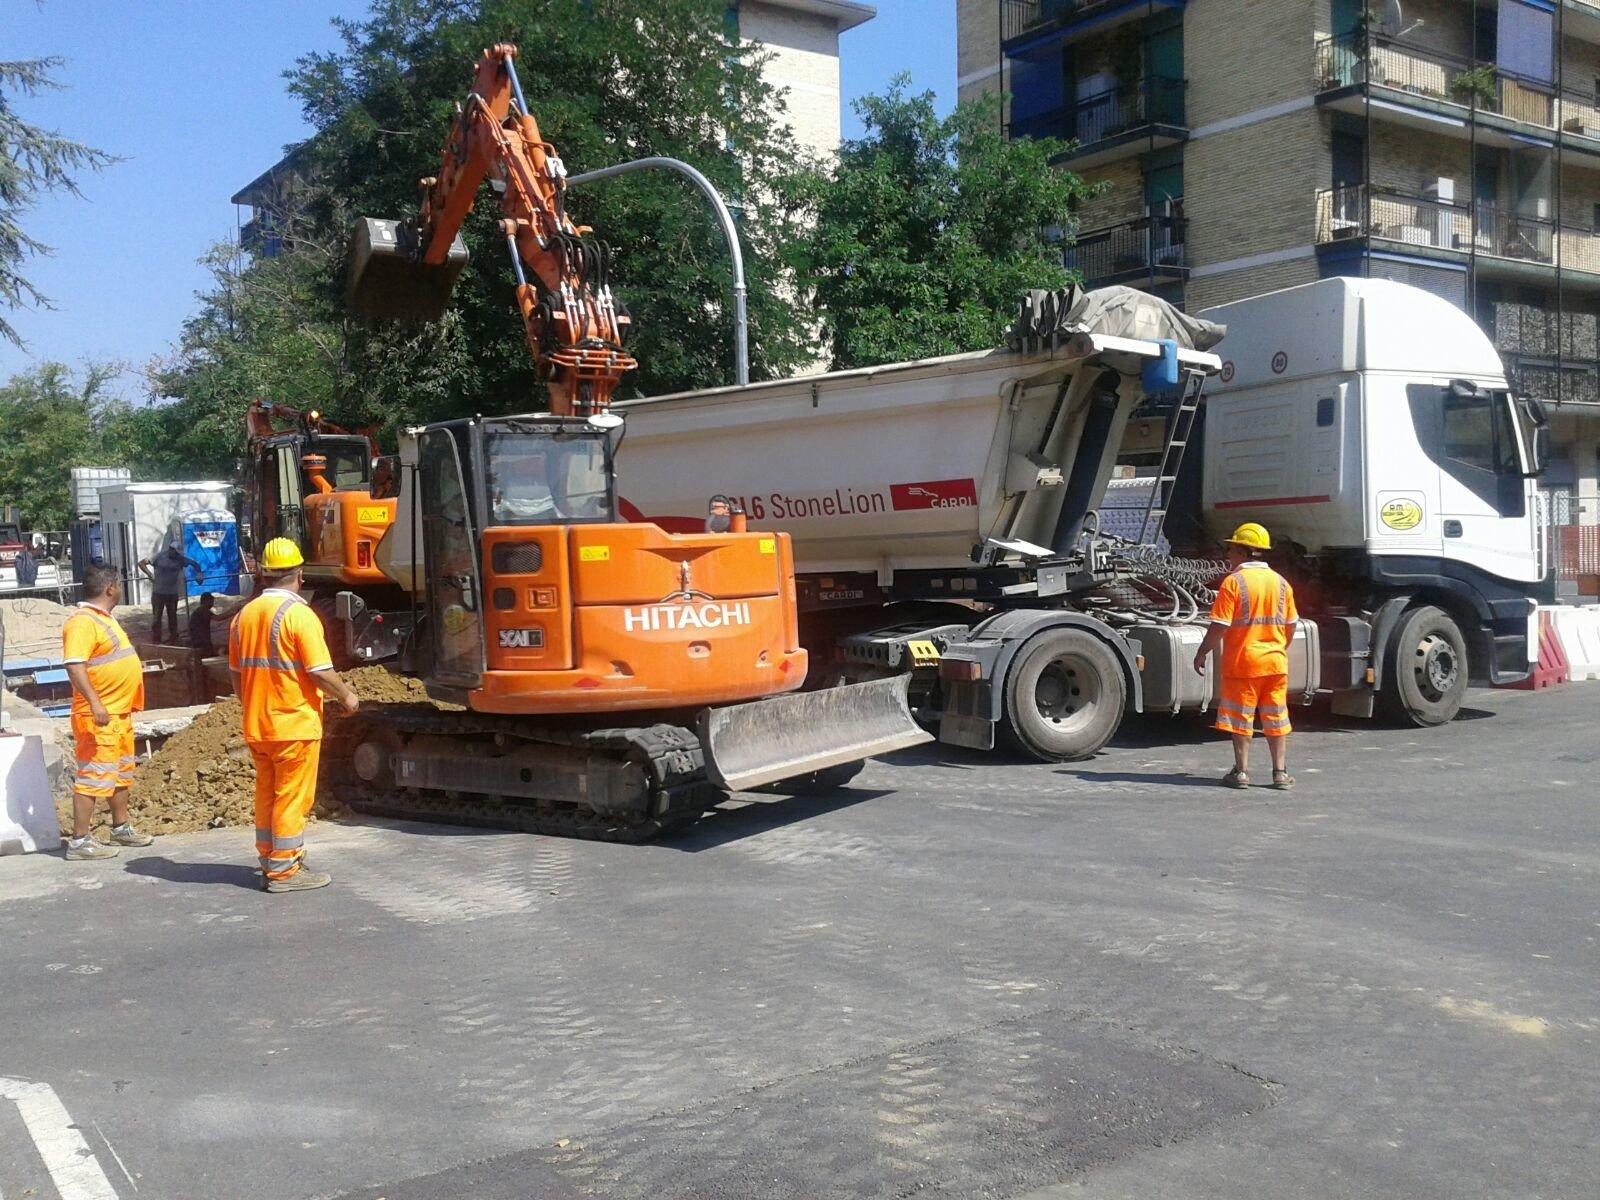 lavori di manutenzione in strada